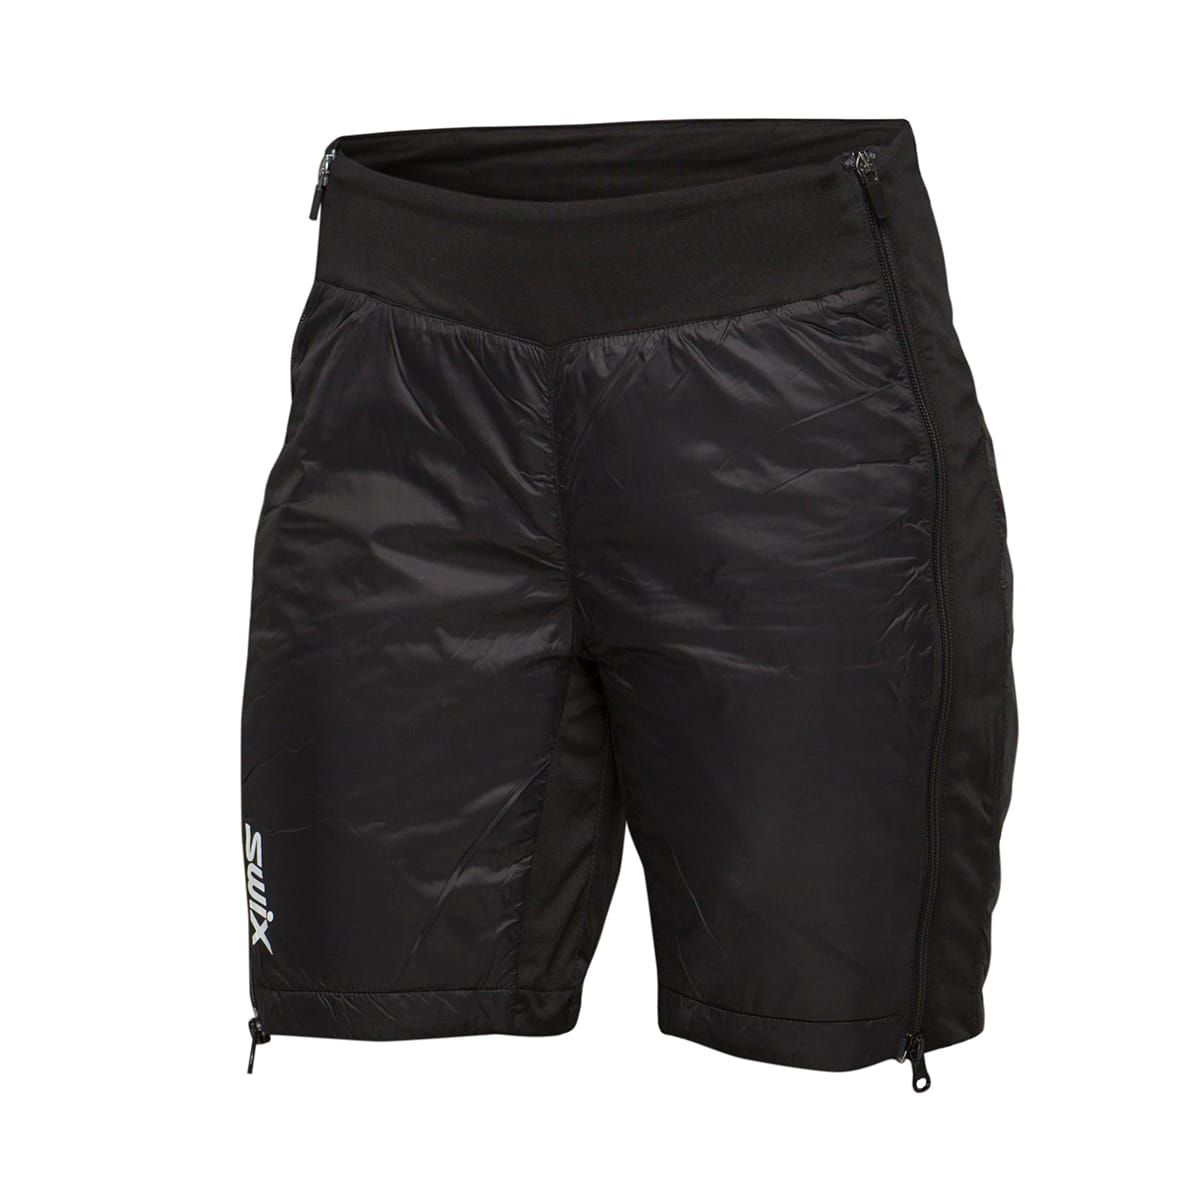 Kjøp Norrøna Falketind Dri3 Pants Men's fra Outnorth